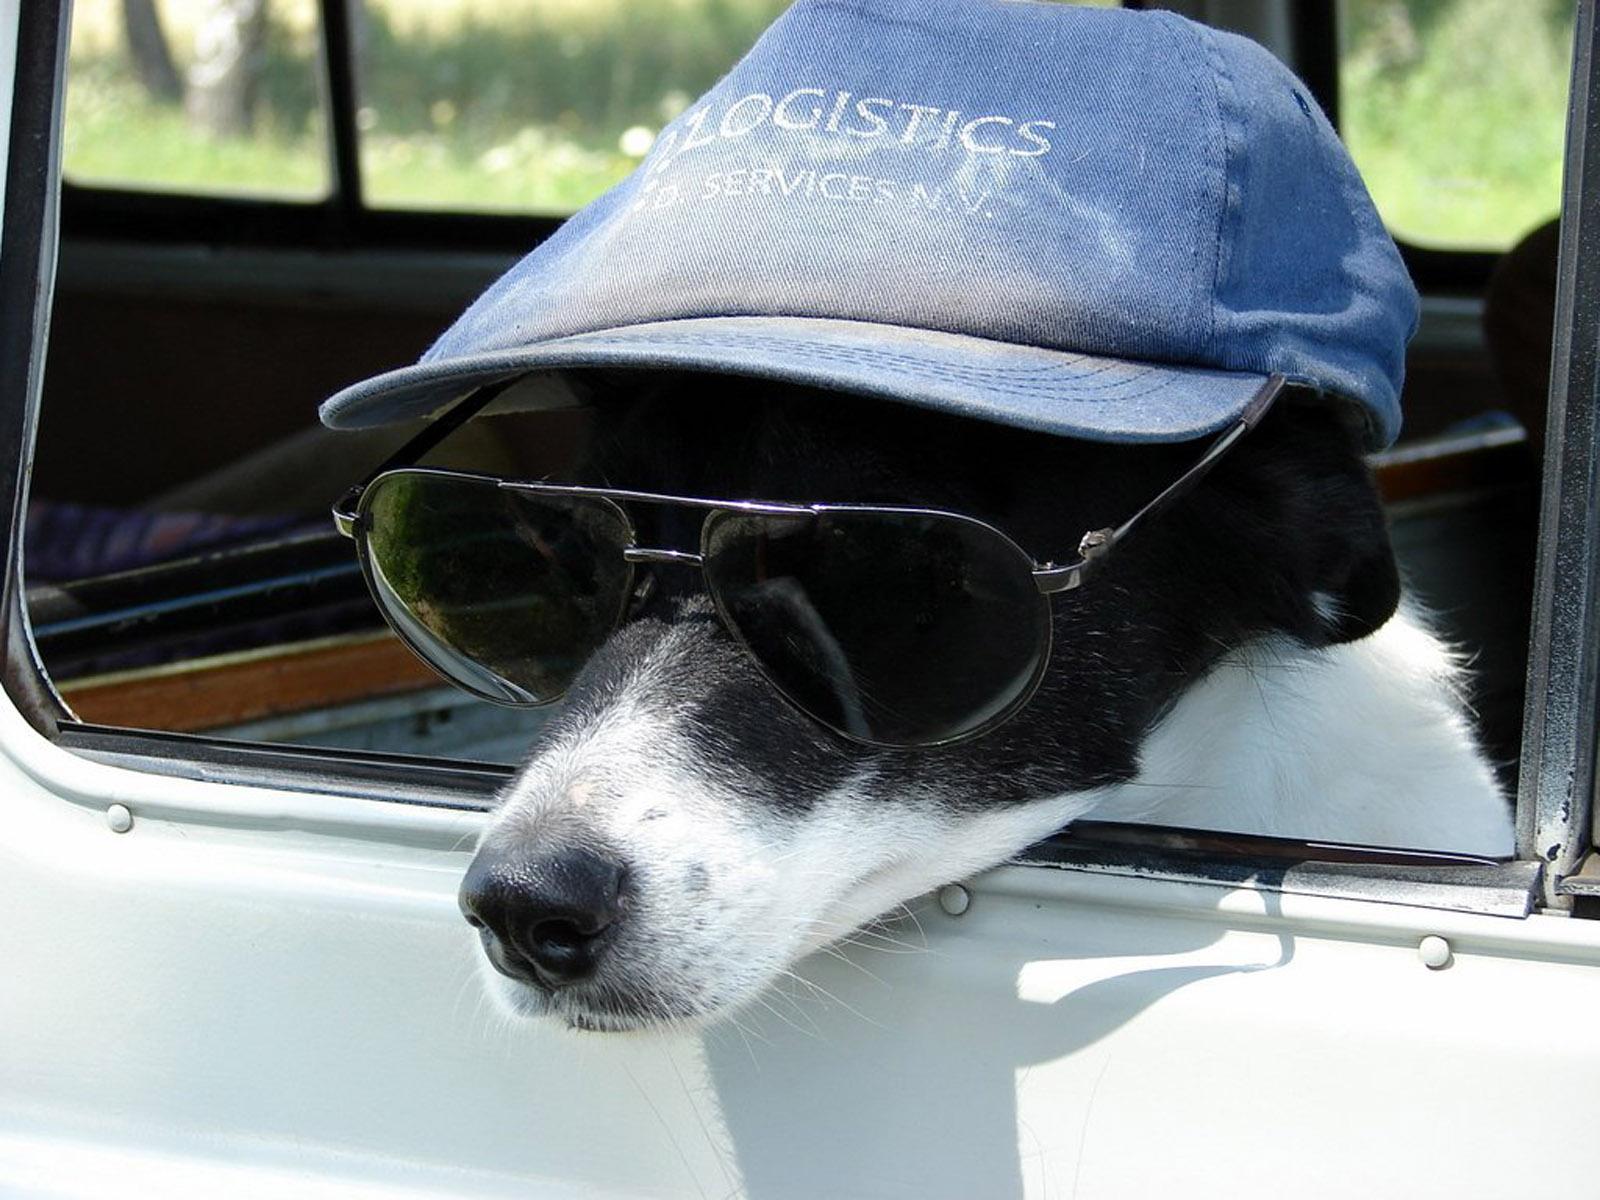 http://3.bp.blogspot.com/_V6TVDECge74/TGV2jQFSZuI/AAAAAAAAA_0/nyp9-S78JN4/s1600/chien+avec+une+casquette.jpg